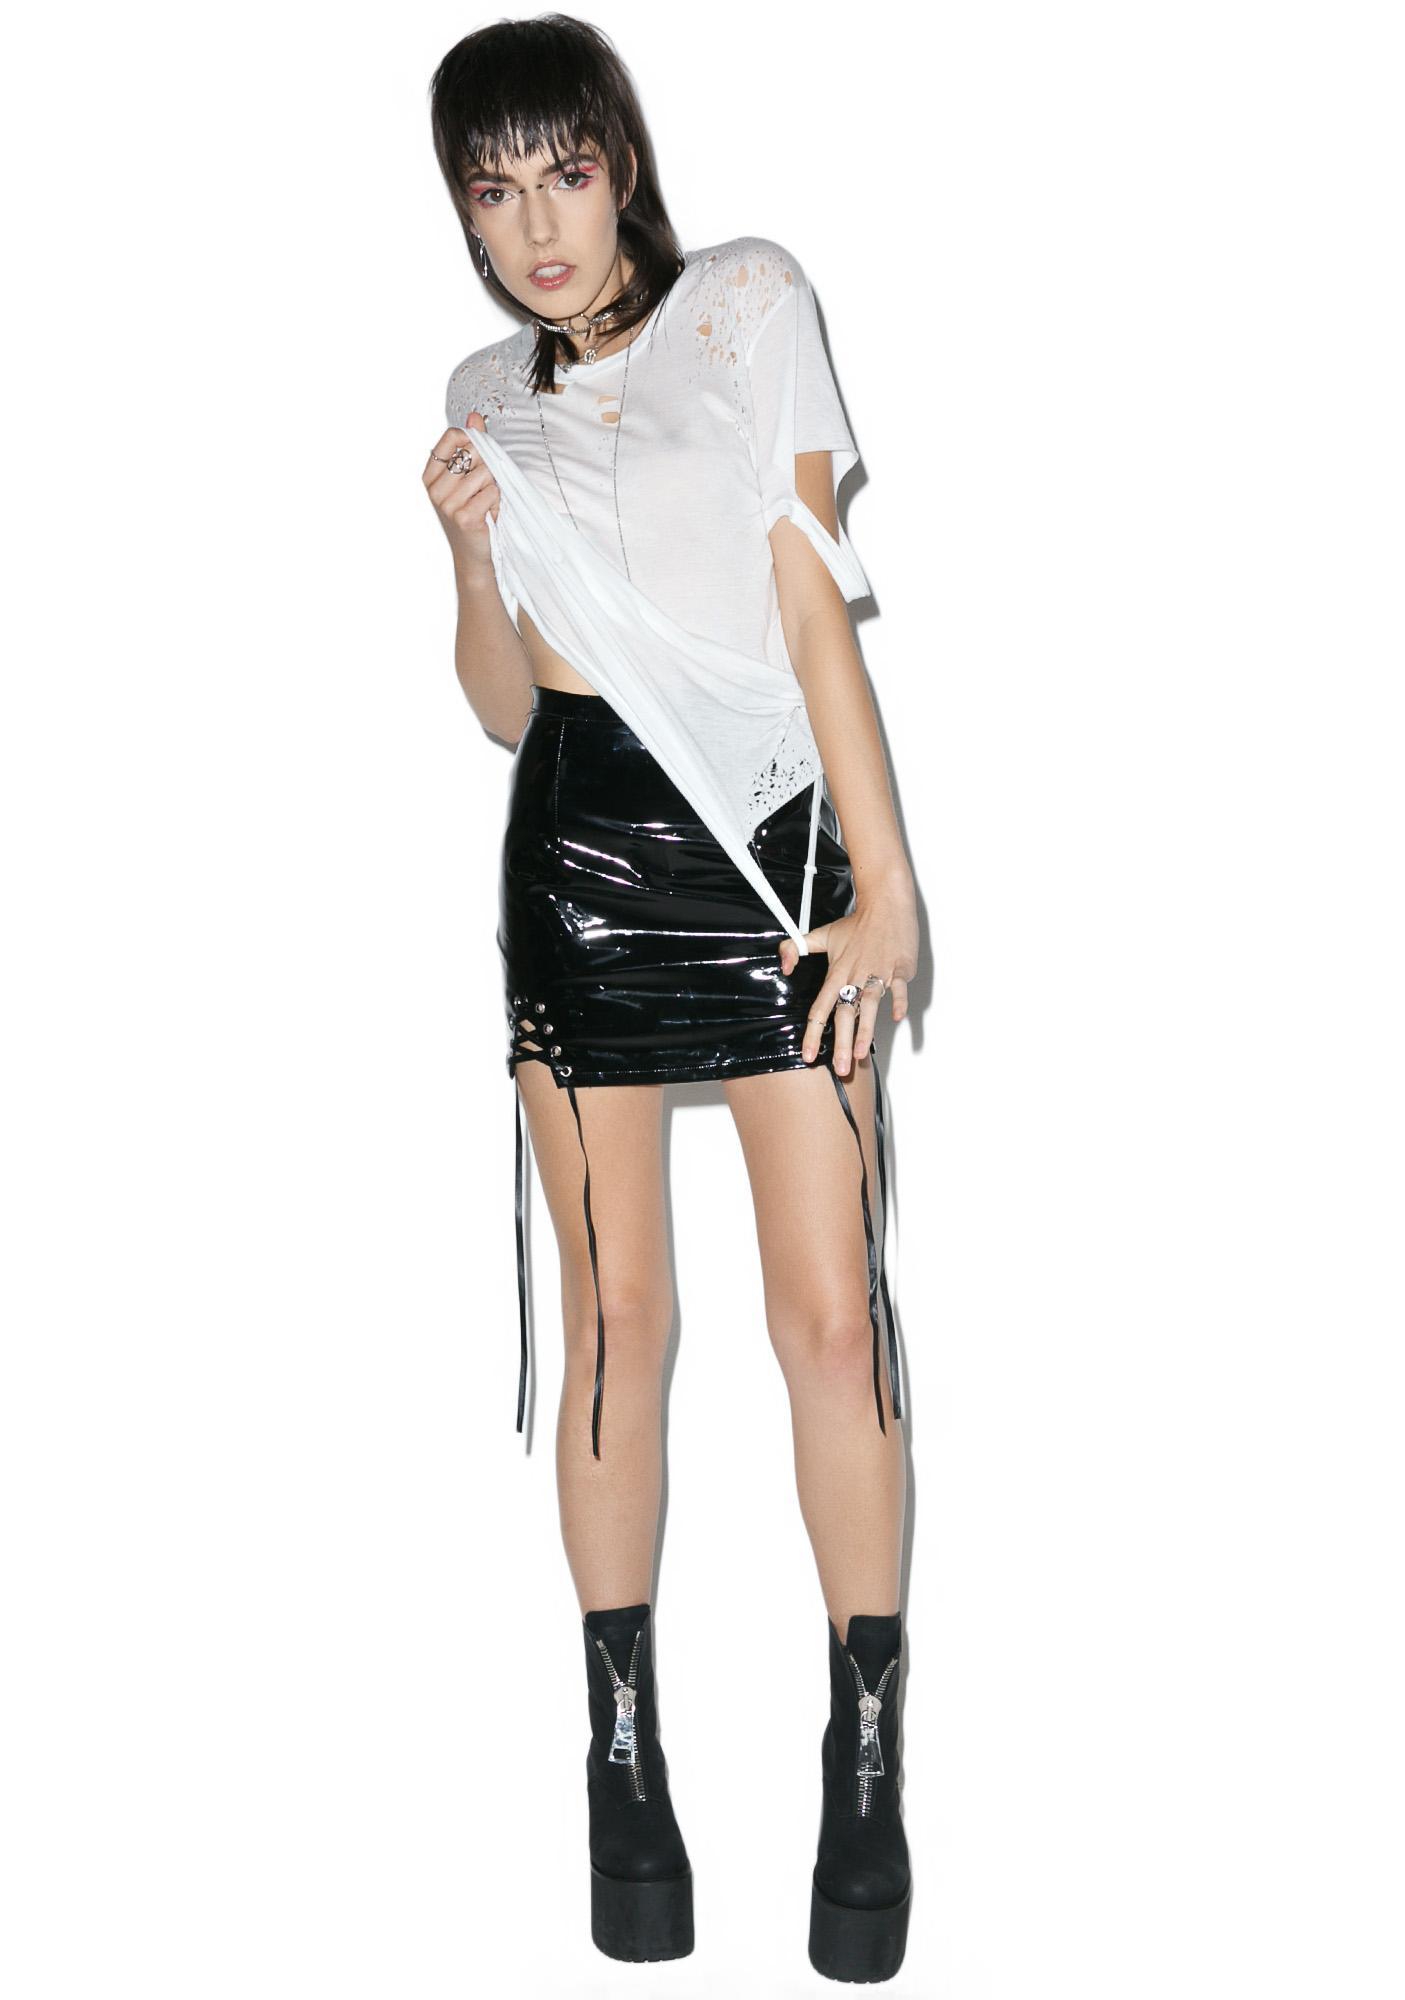 The Trash Rack Pact Mini Skirt